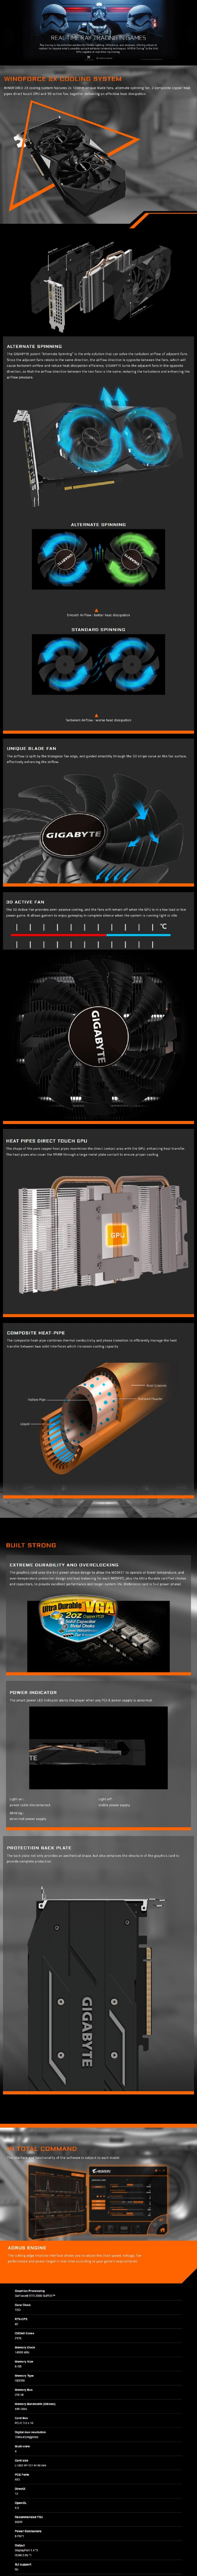 Gigabyte GeForce RTX 2060 Super Windforce OC 8GB